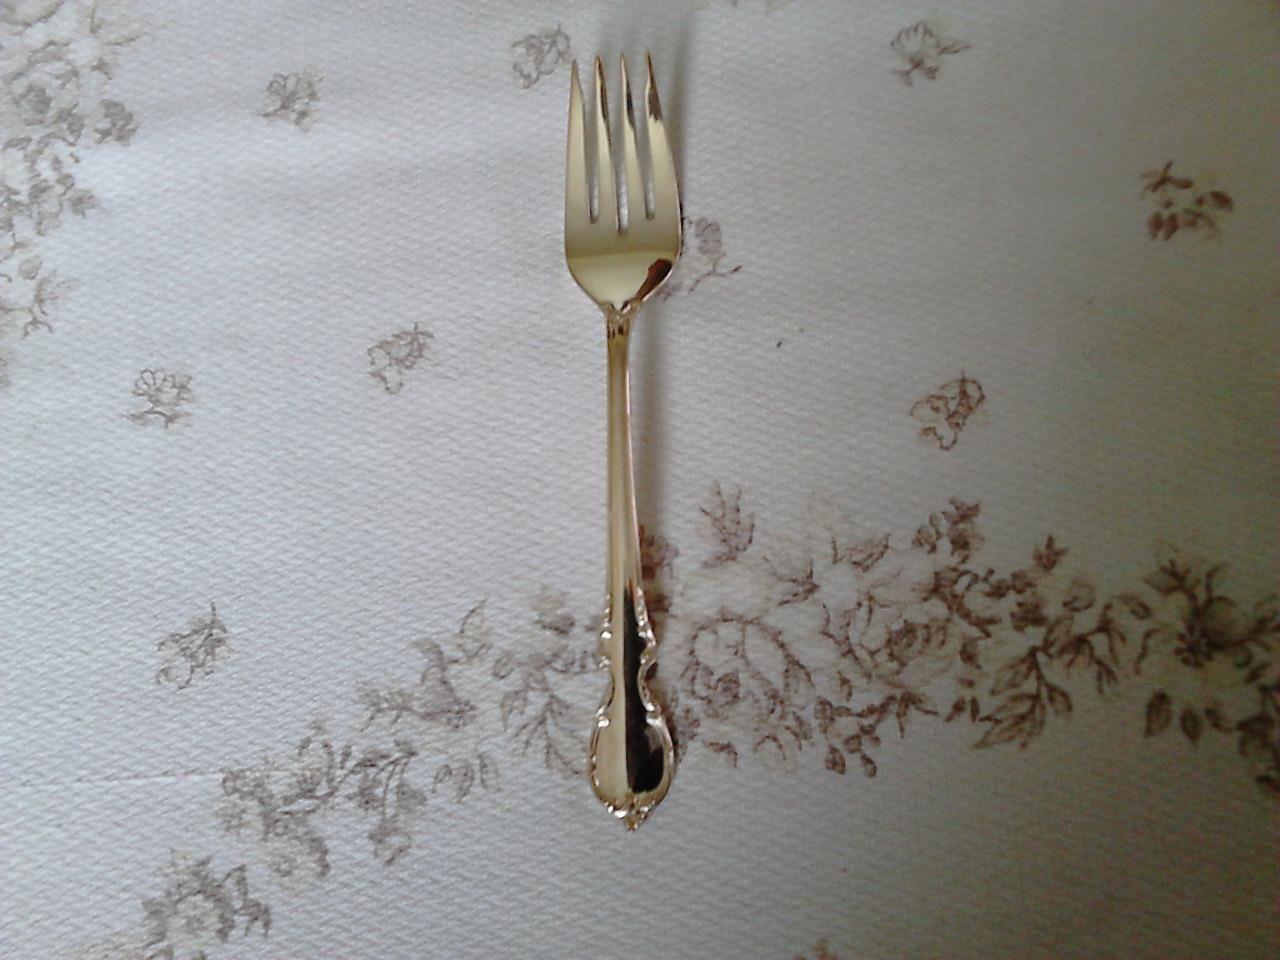 1847 Rogers Reflection (1959) individual salad fork GUC - $4.97